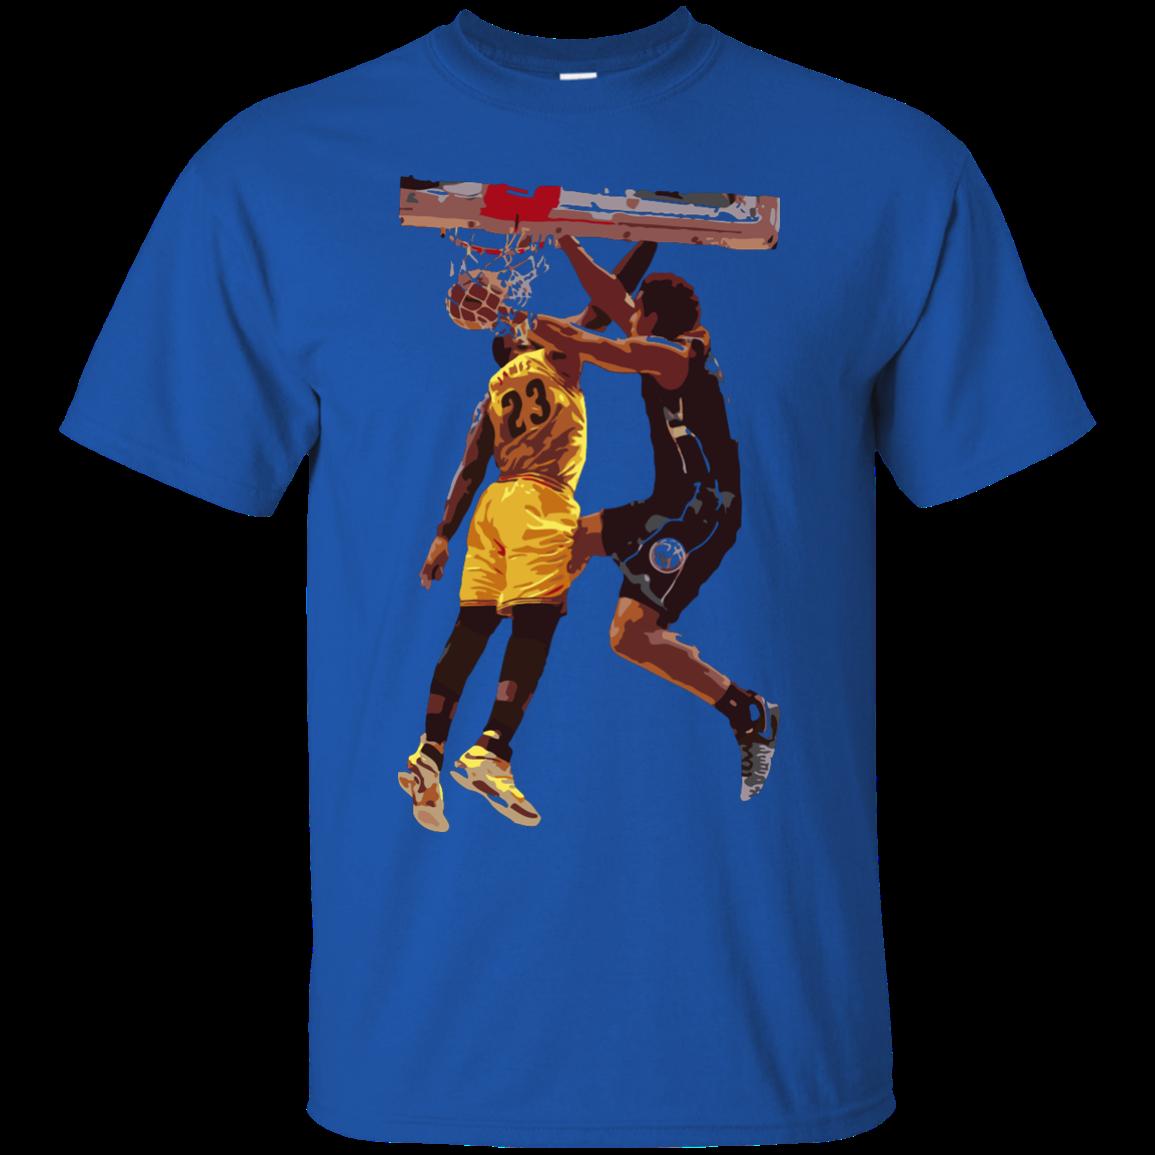 new style 49c01 165fe Malcolm Brogdon Dunk on LeBron James T Shirt, Hoodies, Tank Top